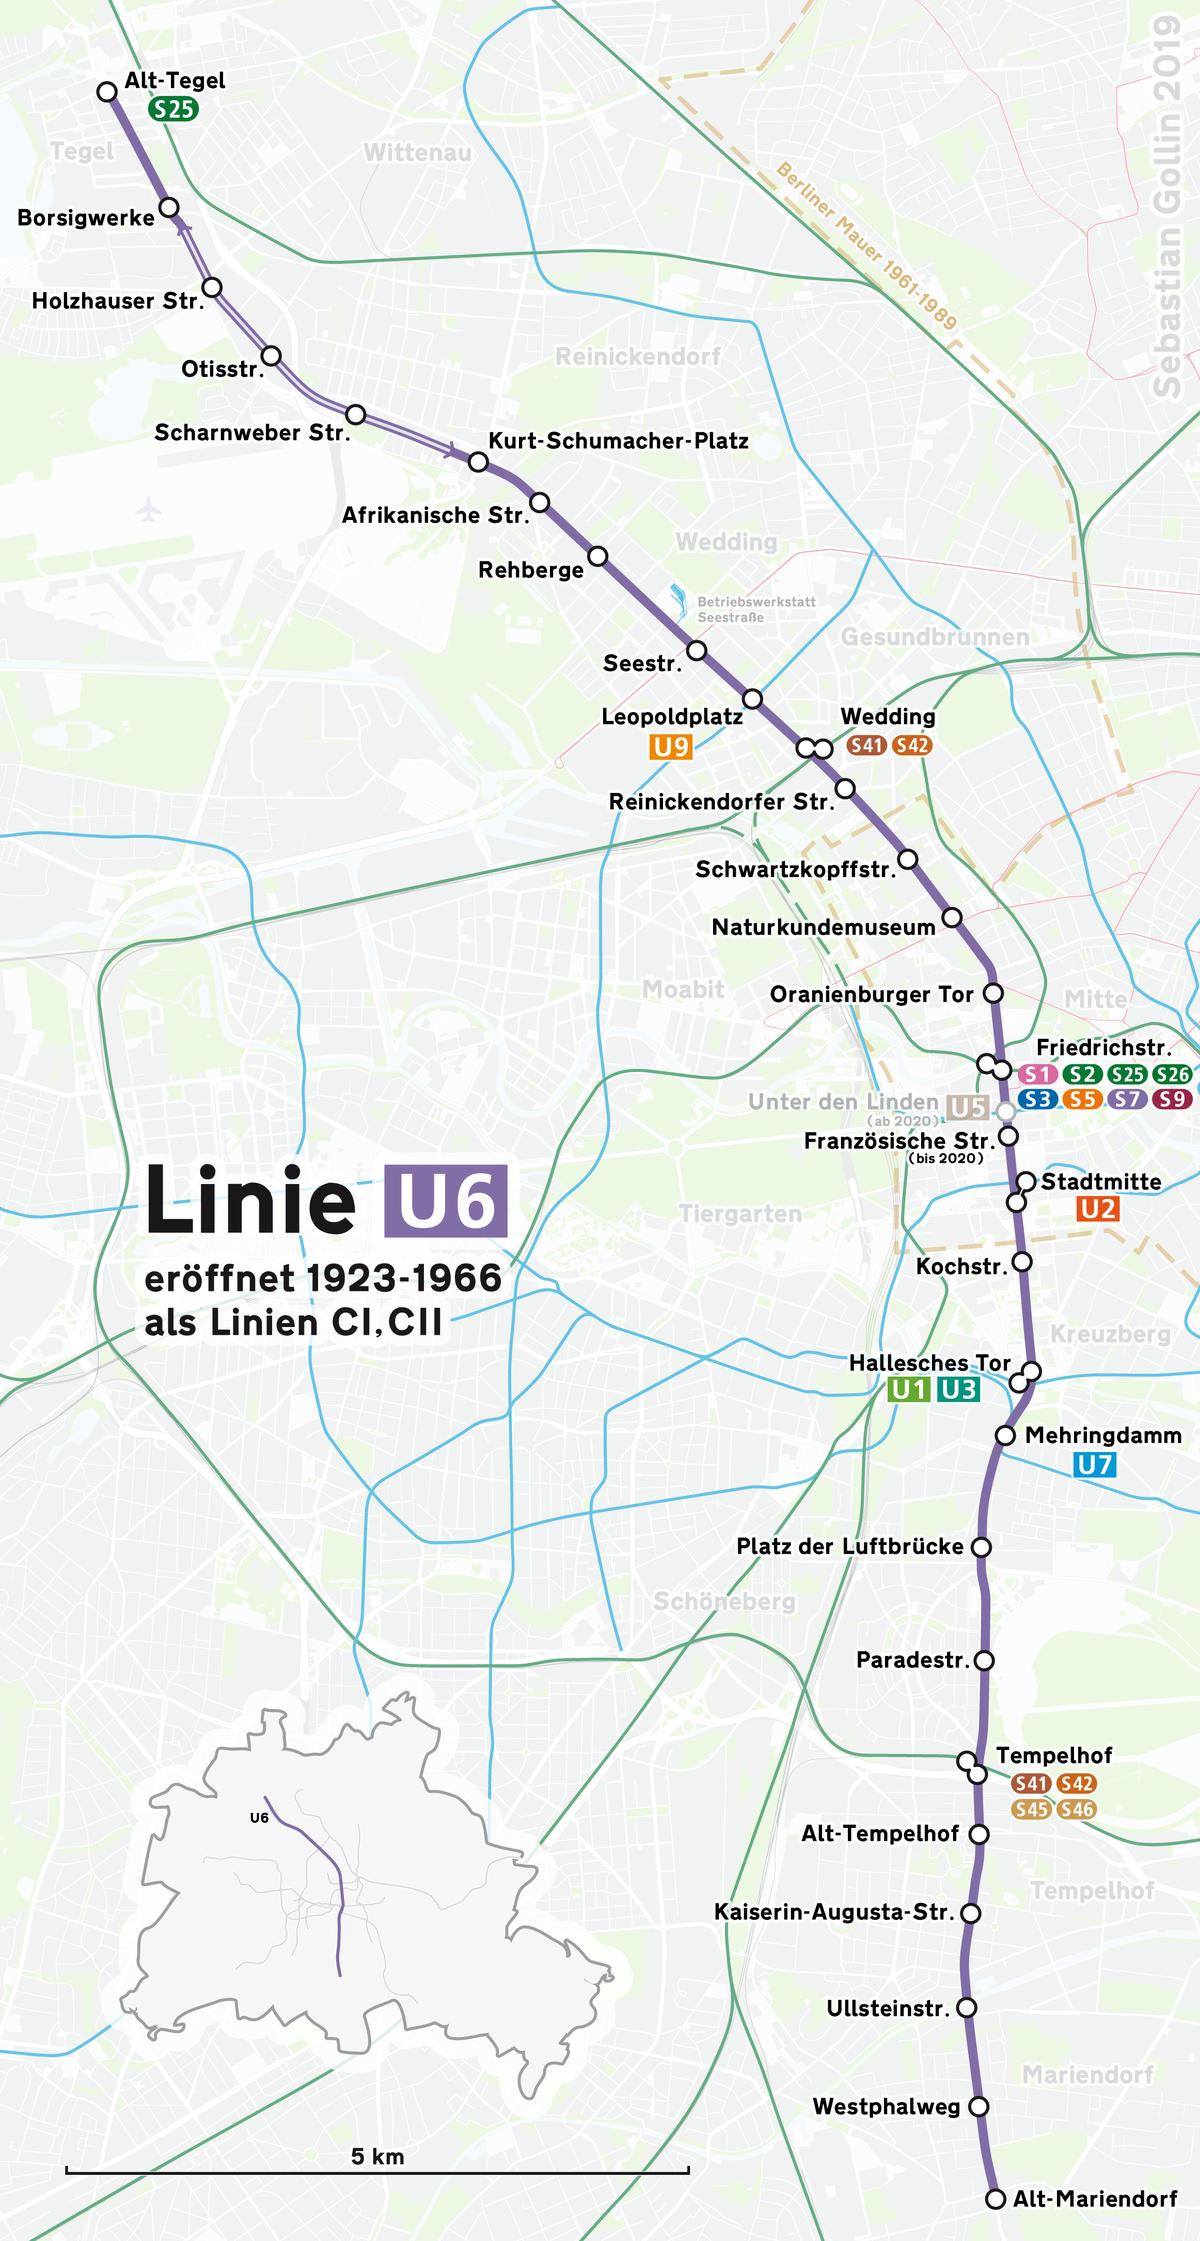 Karte Berlin Lichtenrade.U Bahn Linie 6 Berlin Wikipedia